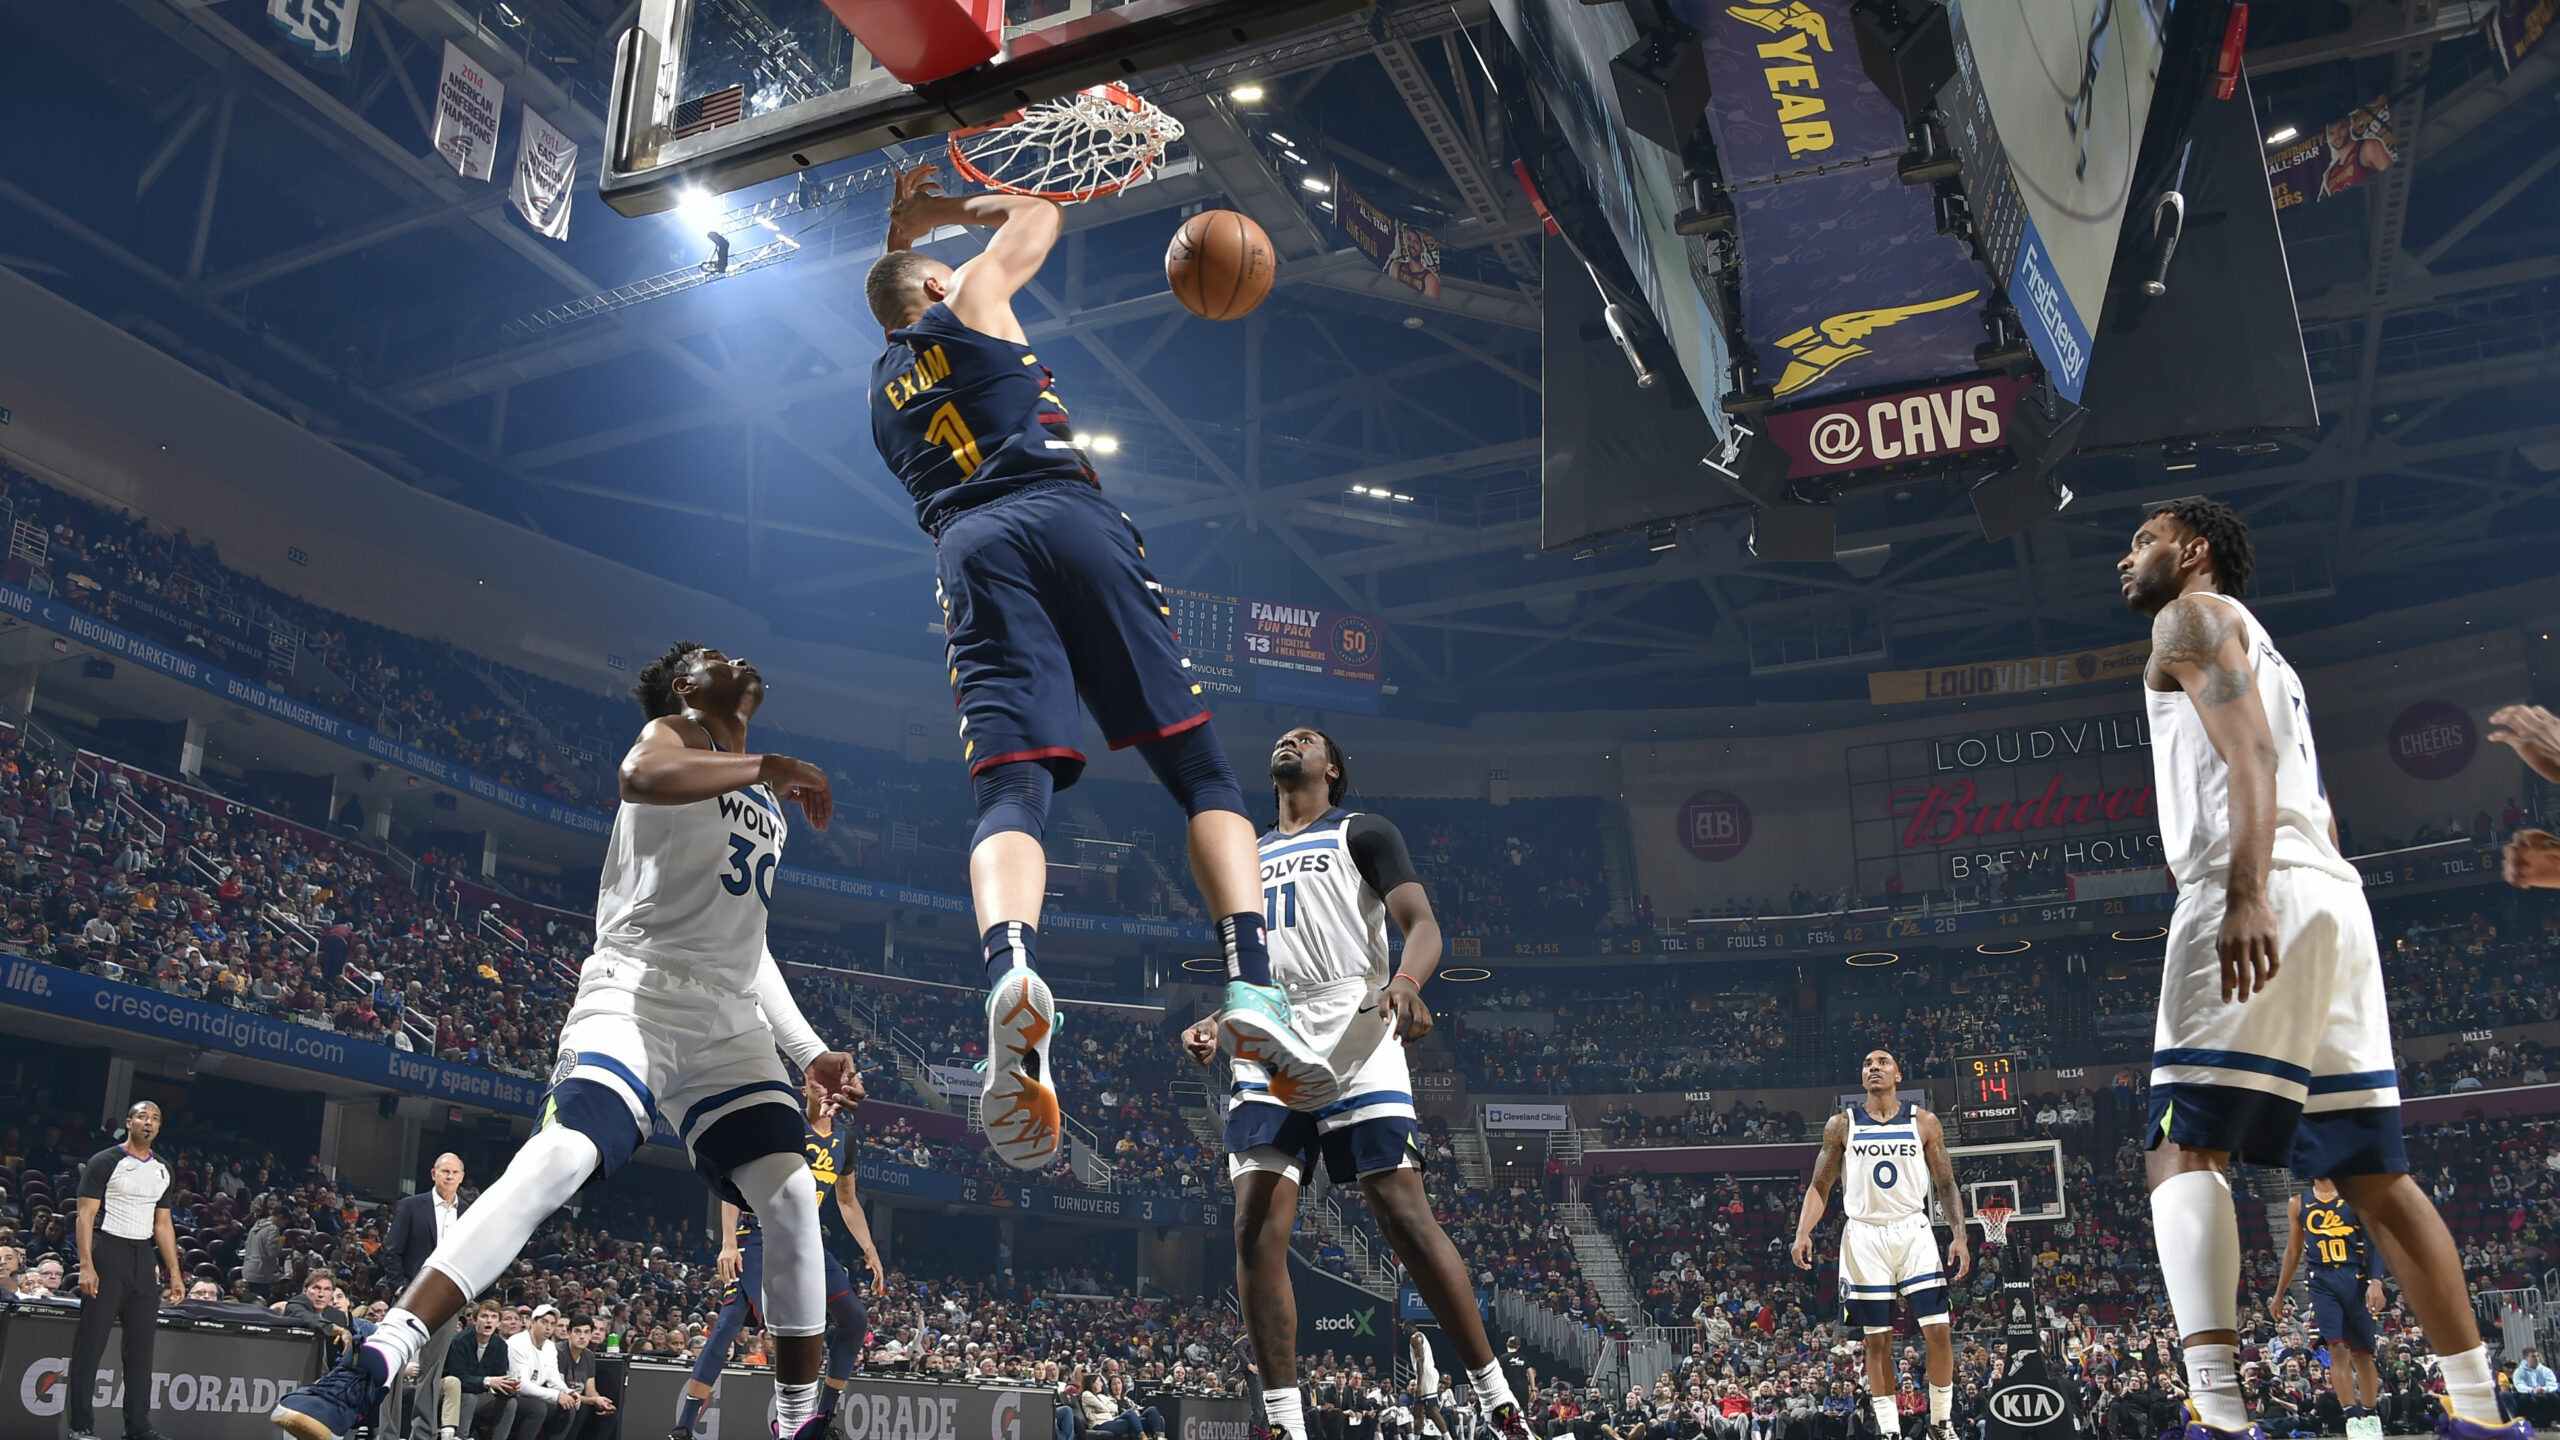 Timberwolves @ Cavaliers